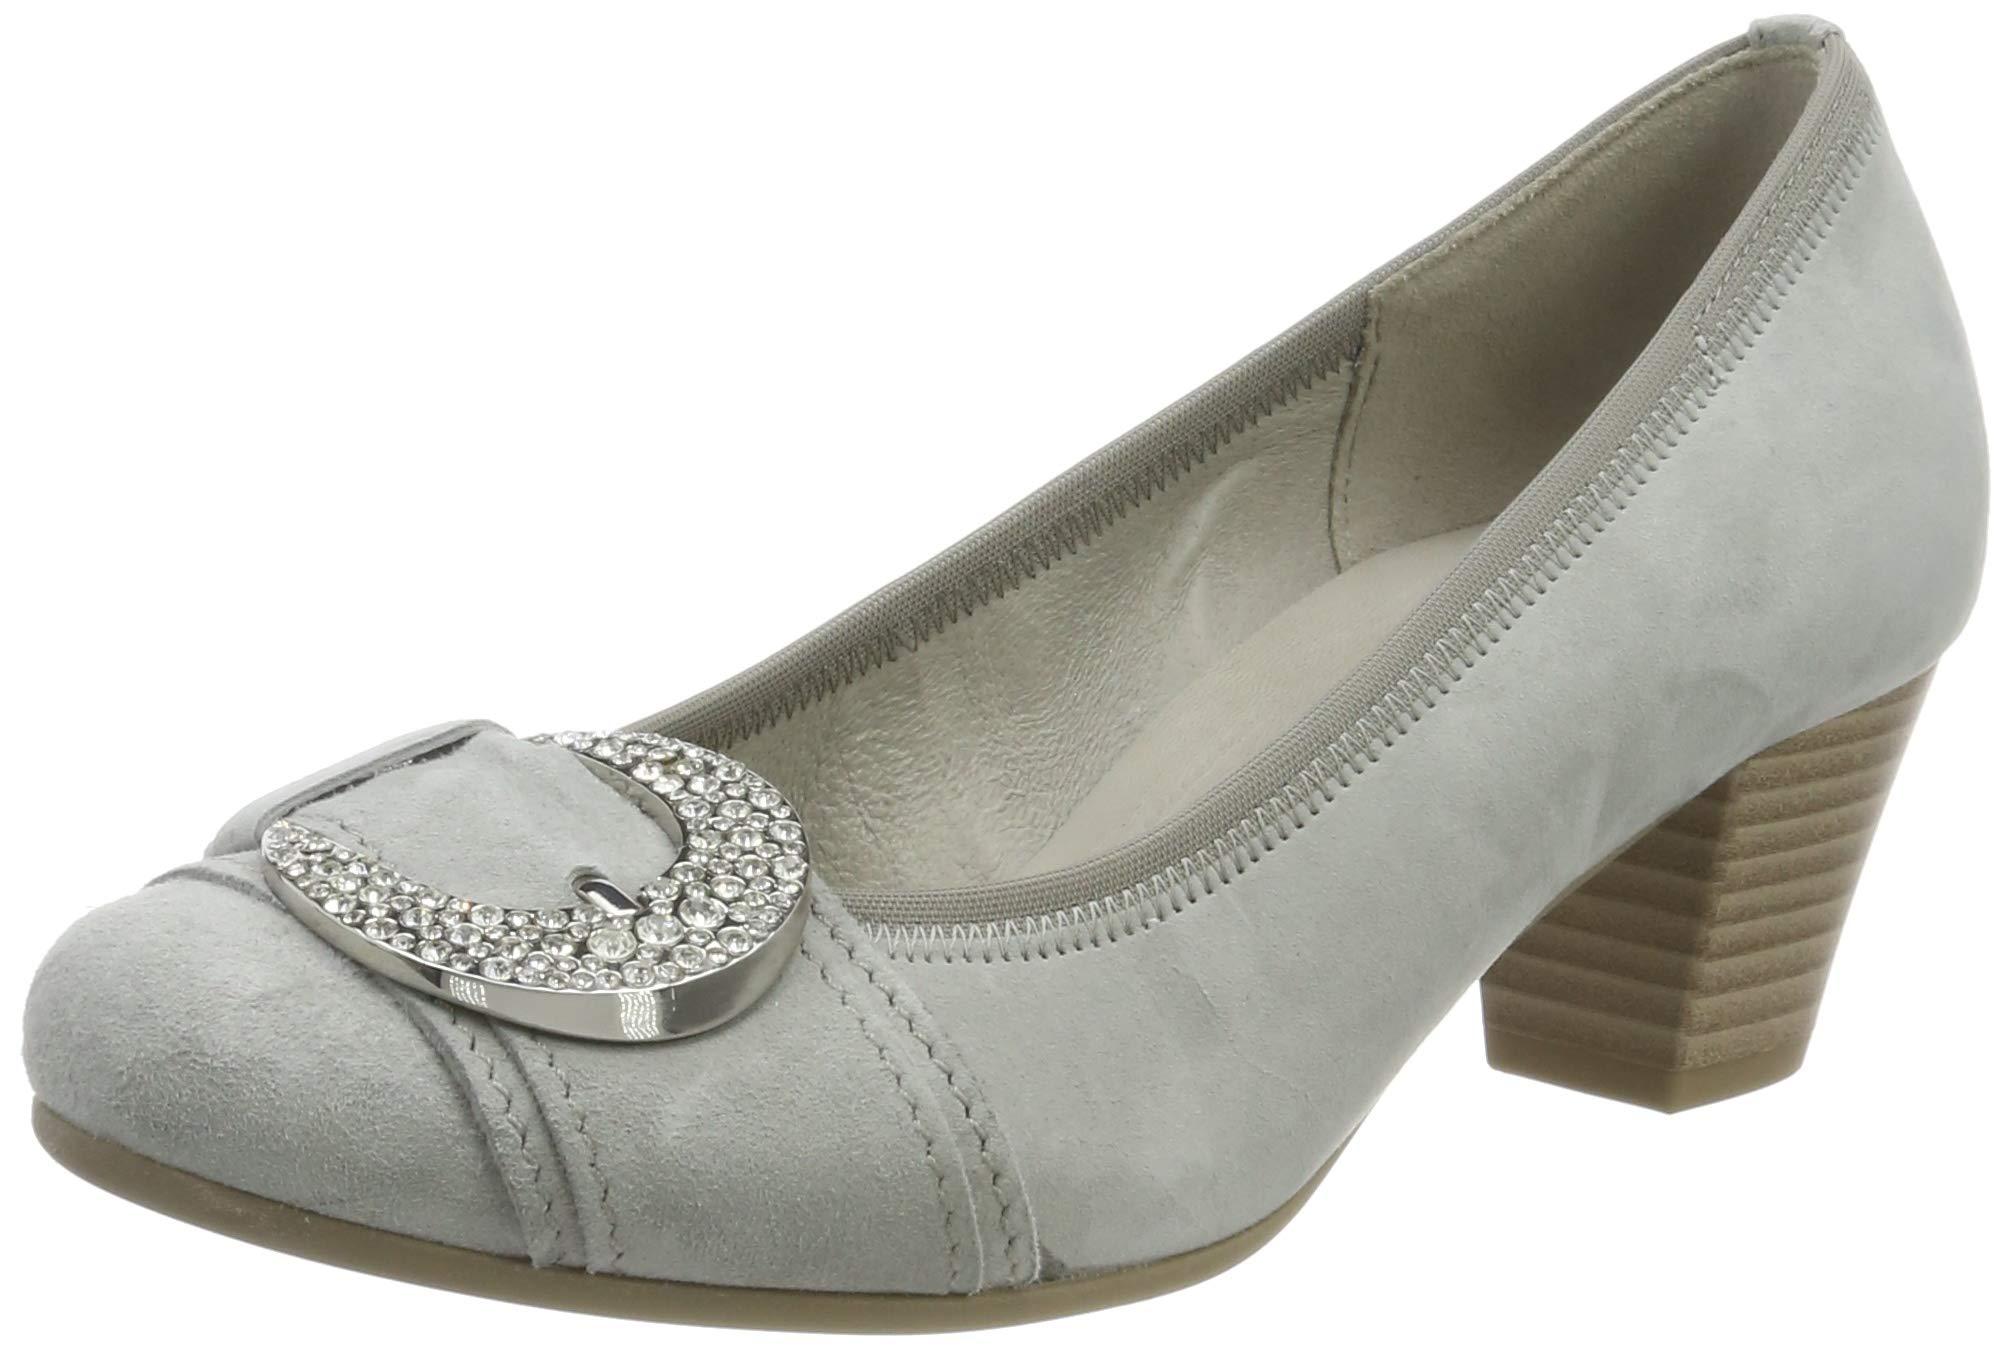 Gabor 5 1938 FemmeGrisgrau Shoes BasicEscarpins Eu R4AjLq35